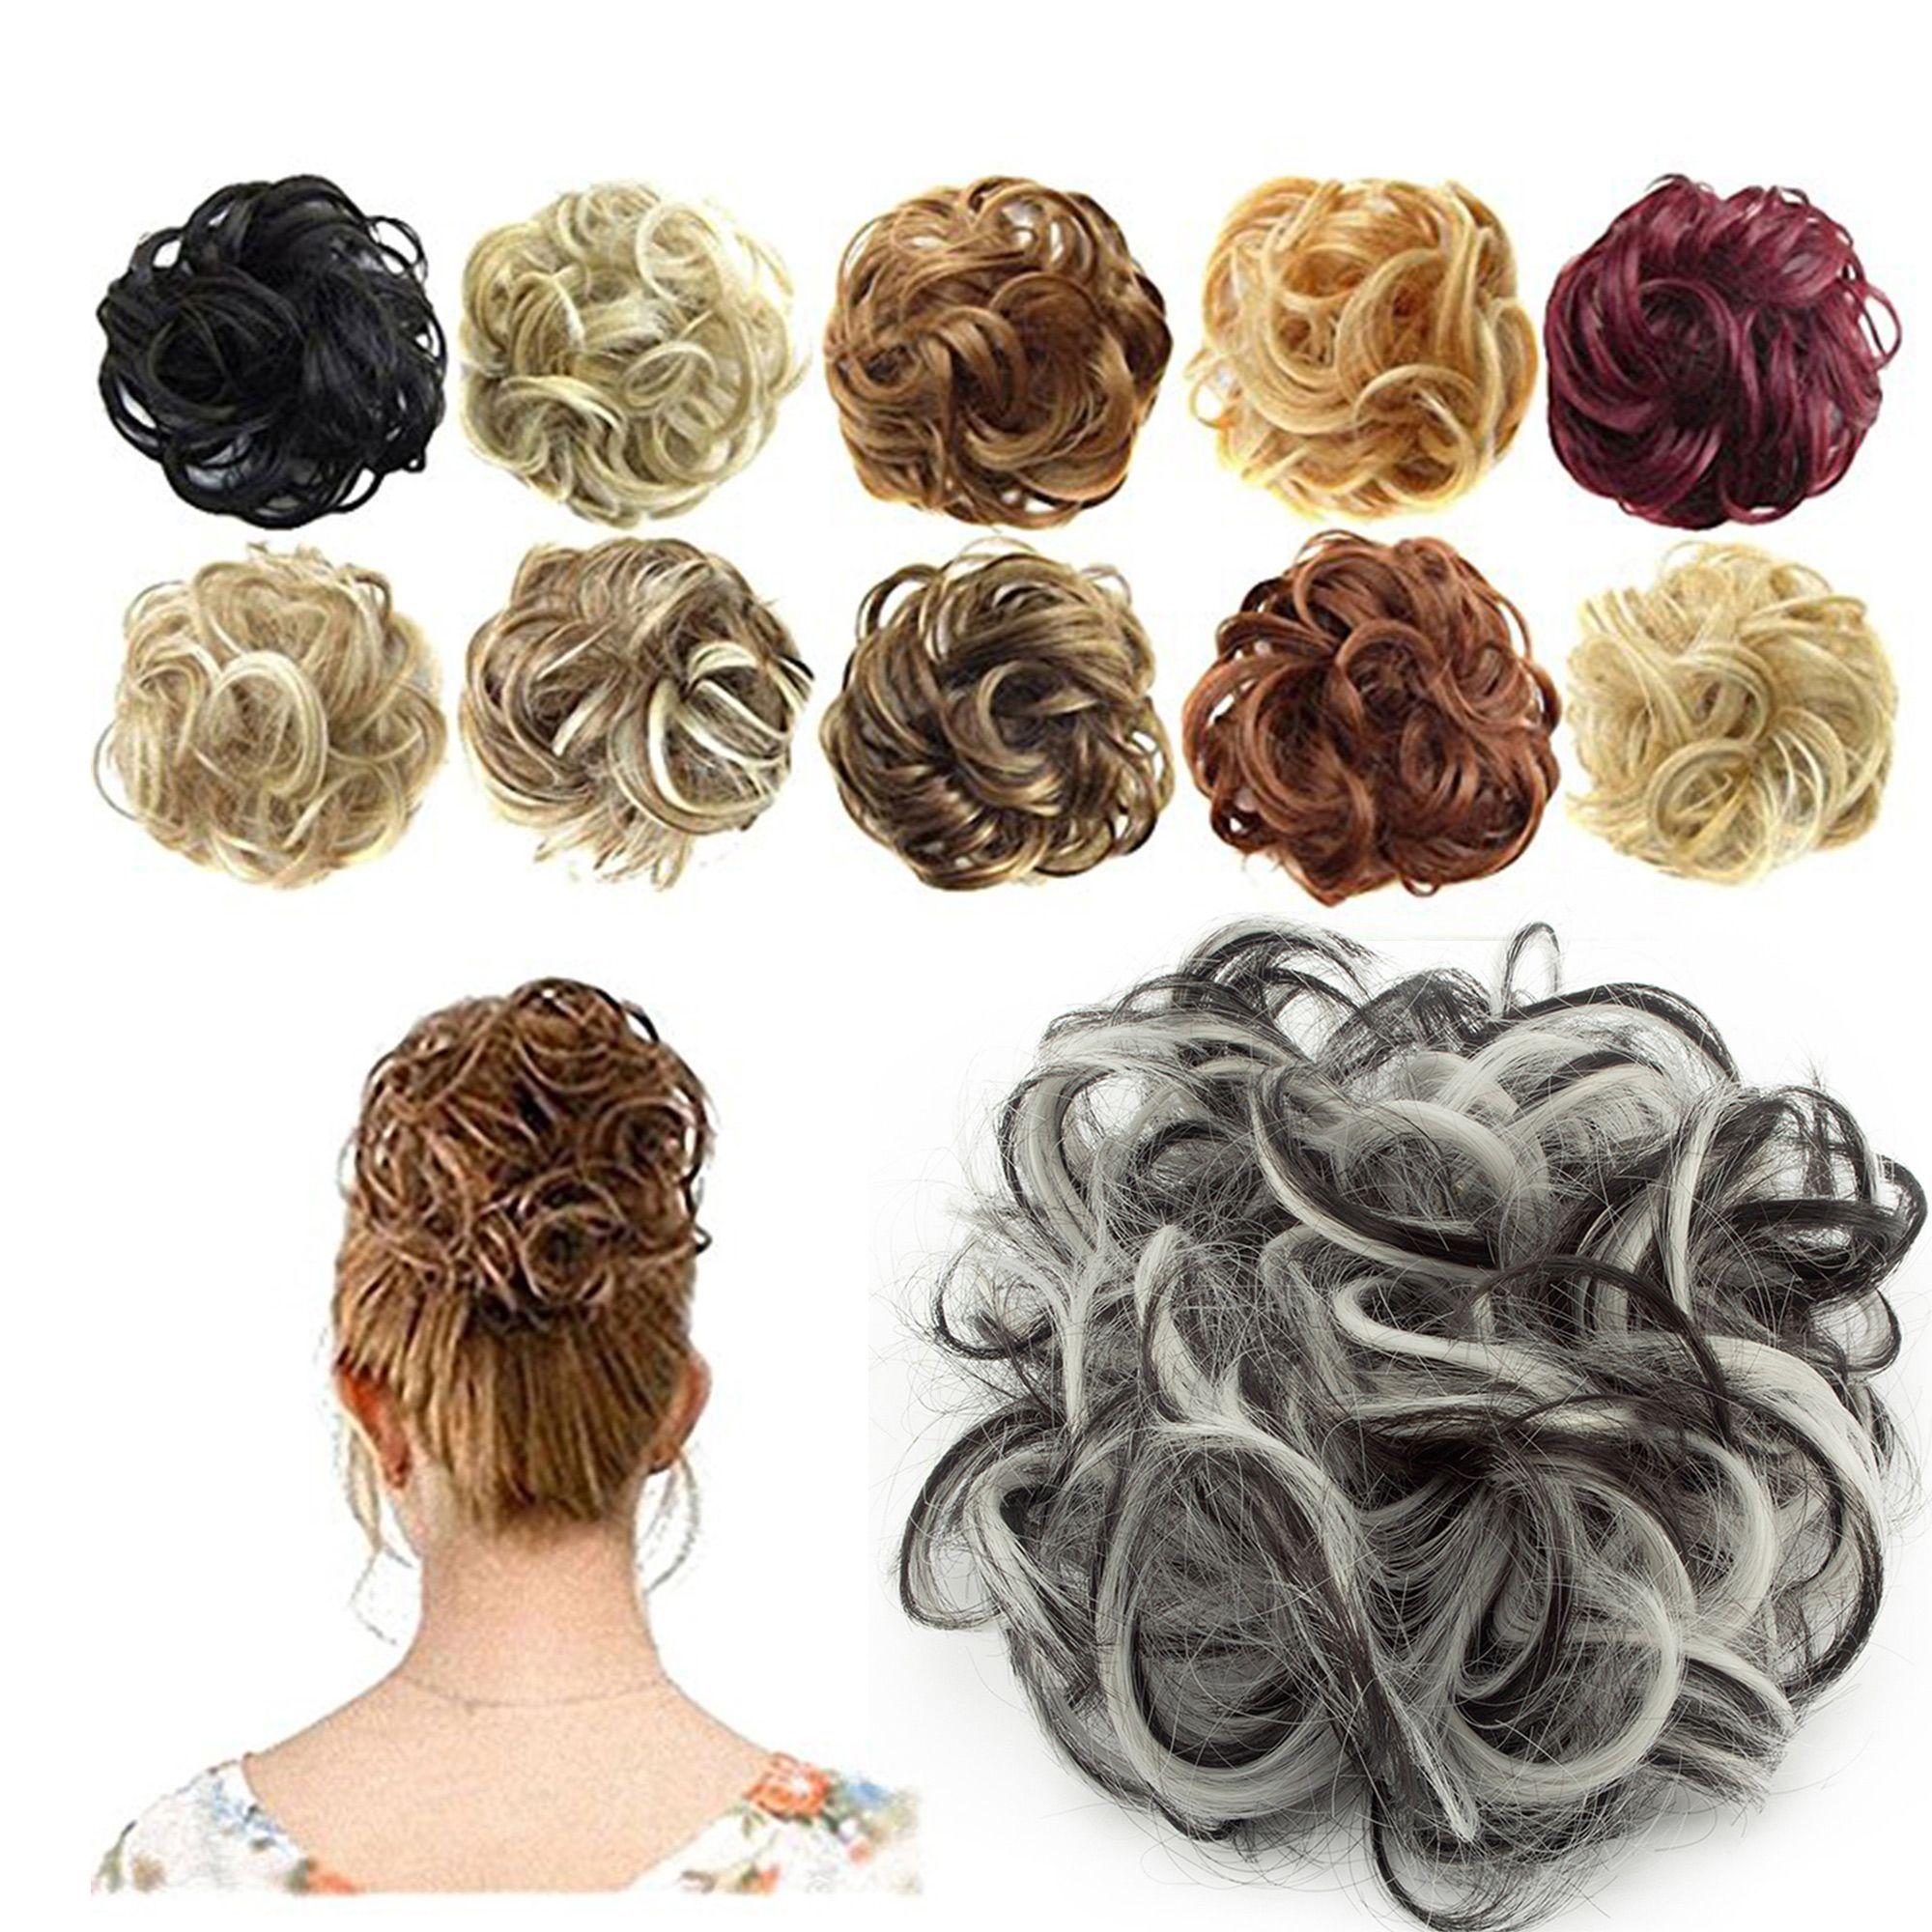 Florata Messy Hair Bun Updo Scrunchies Extension Ponytail Piece - Walmart.com -   13 hair Drawing updo ideas